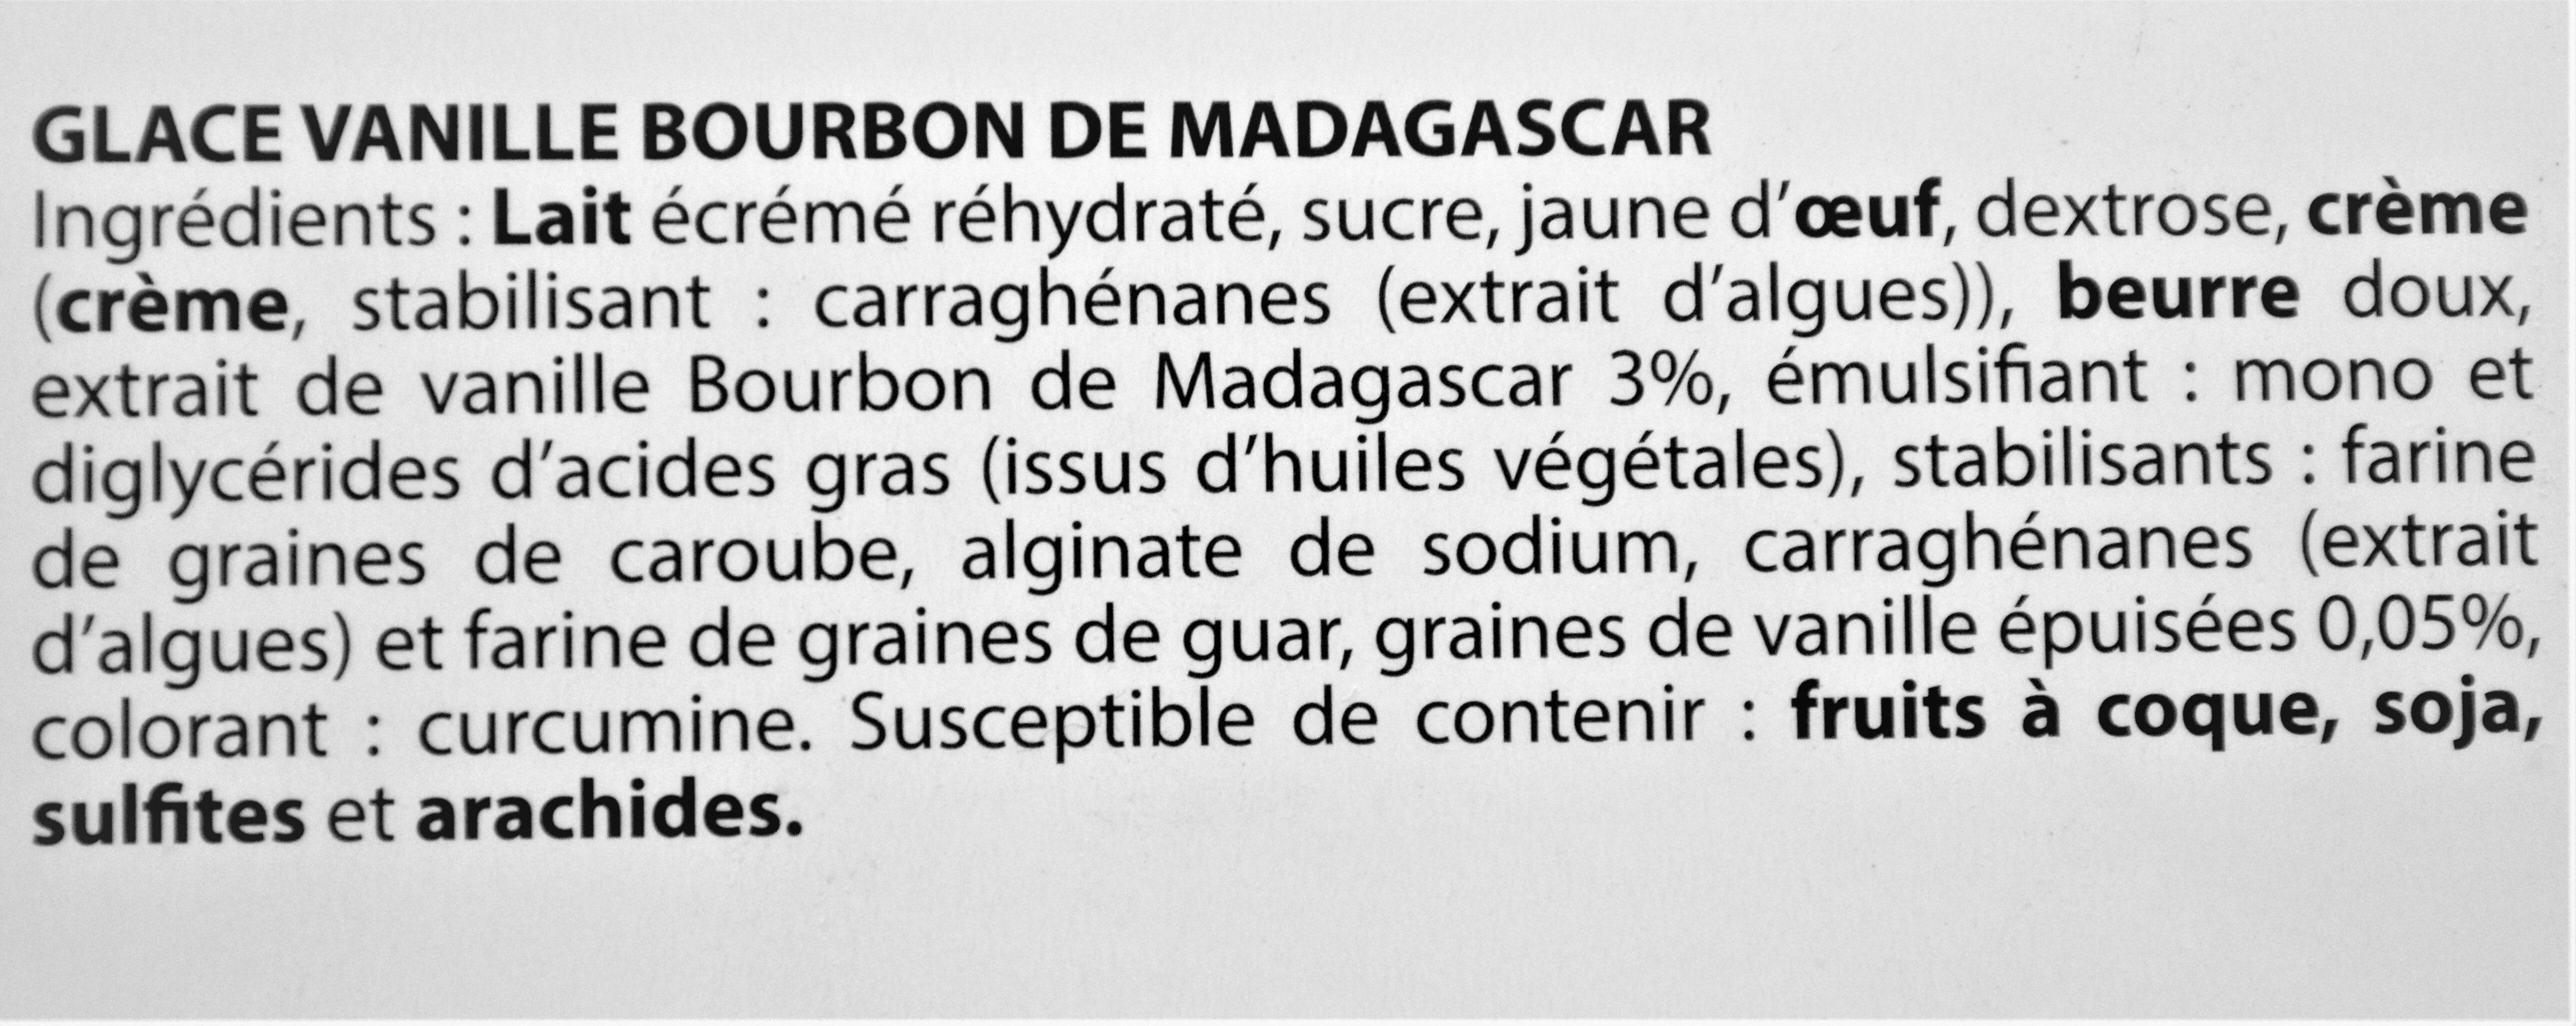 Glace VANILLE BOURBON DE MADAGASCAR - Ingrediënten